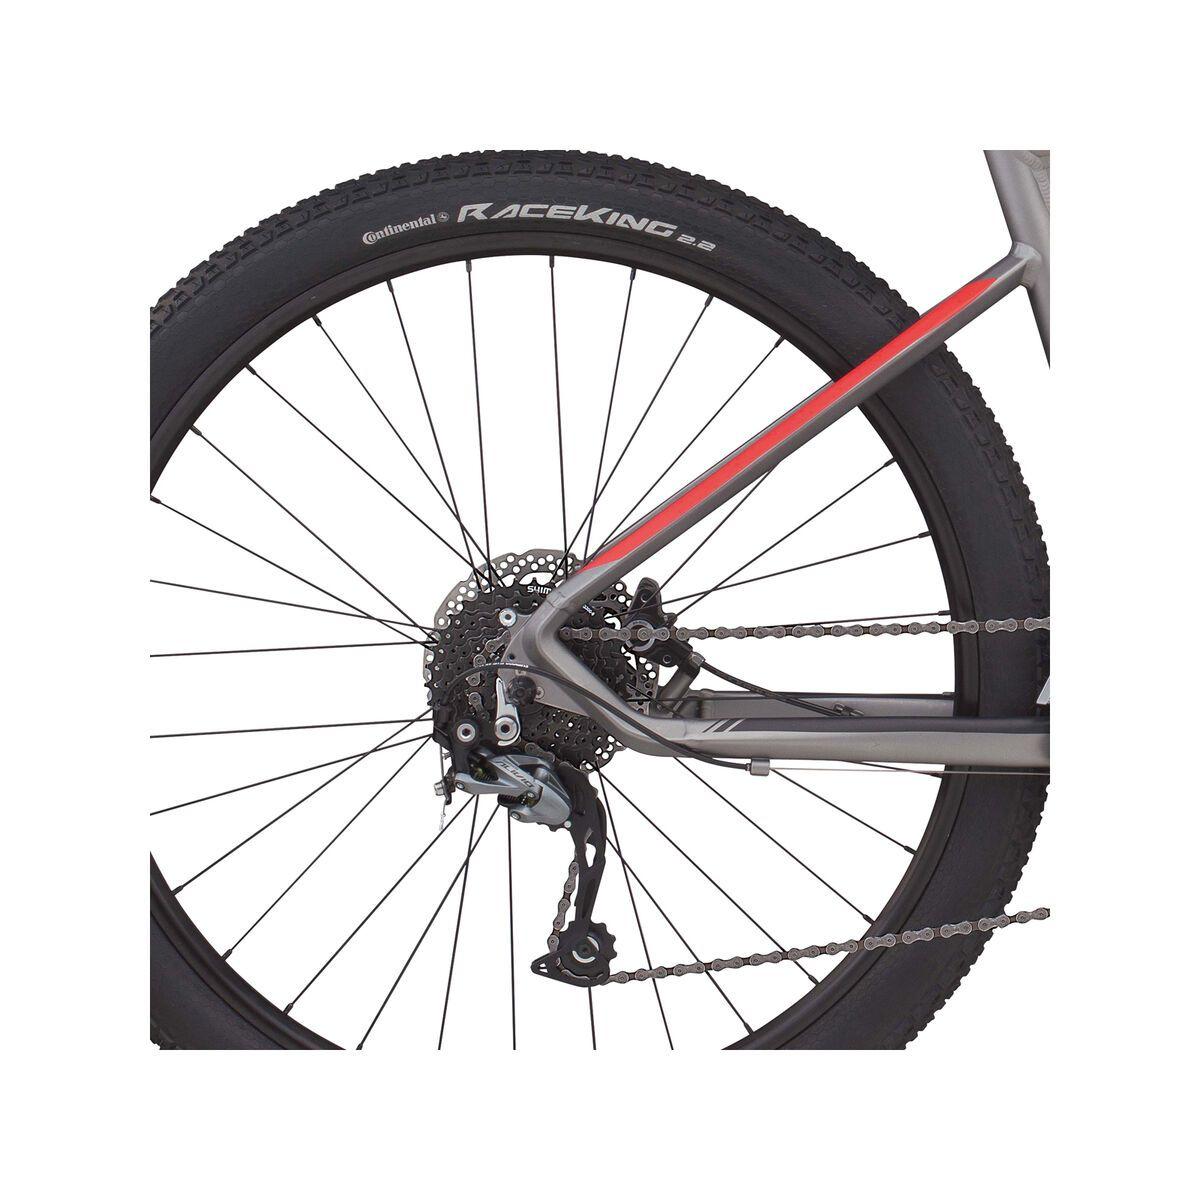 BMC Sportelite SE Alivio, grey | Bild 4